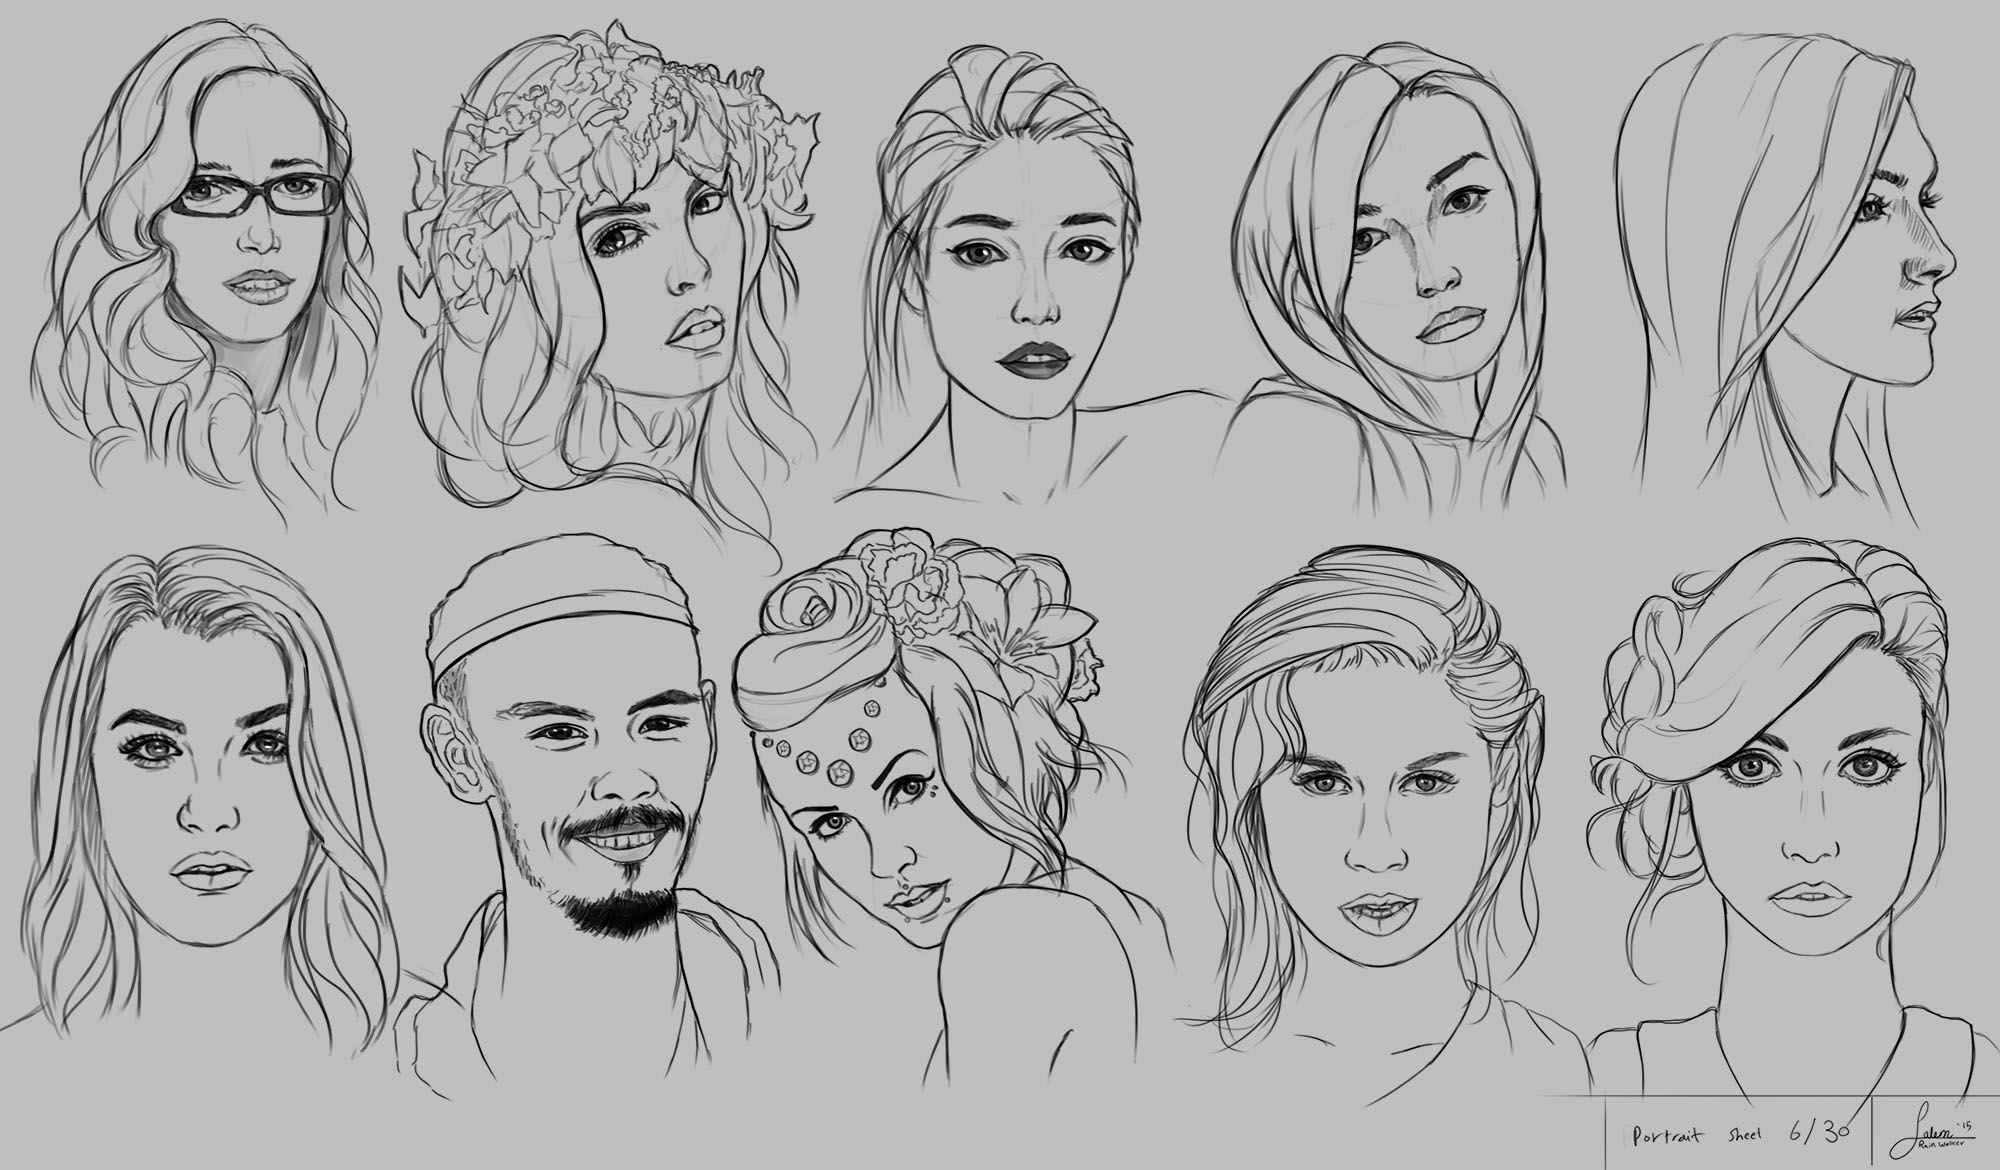 Portrait Drawng - Practice Sheet no. 6/30